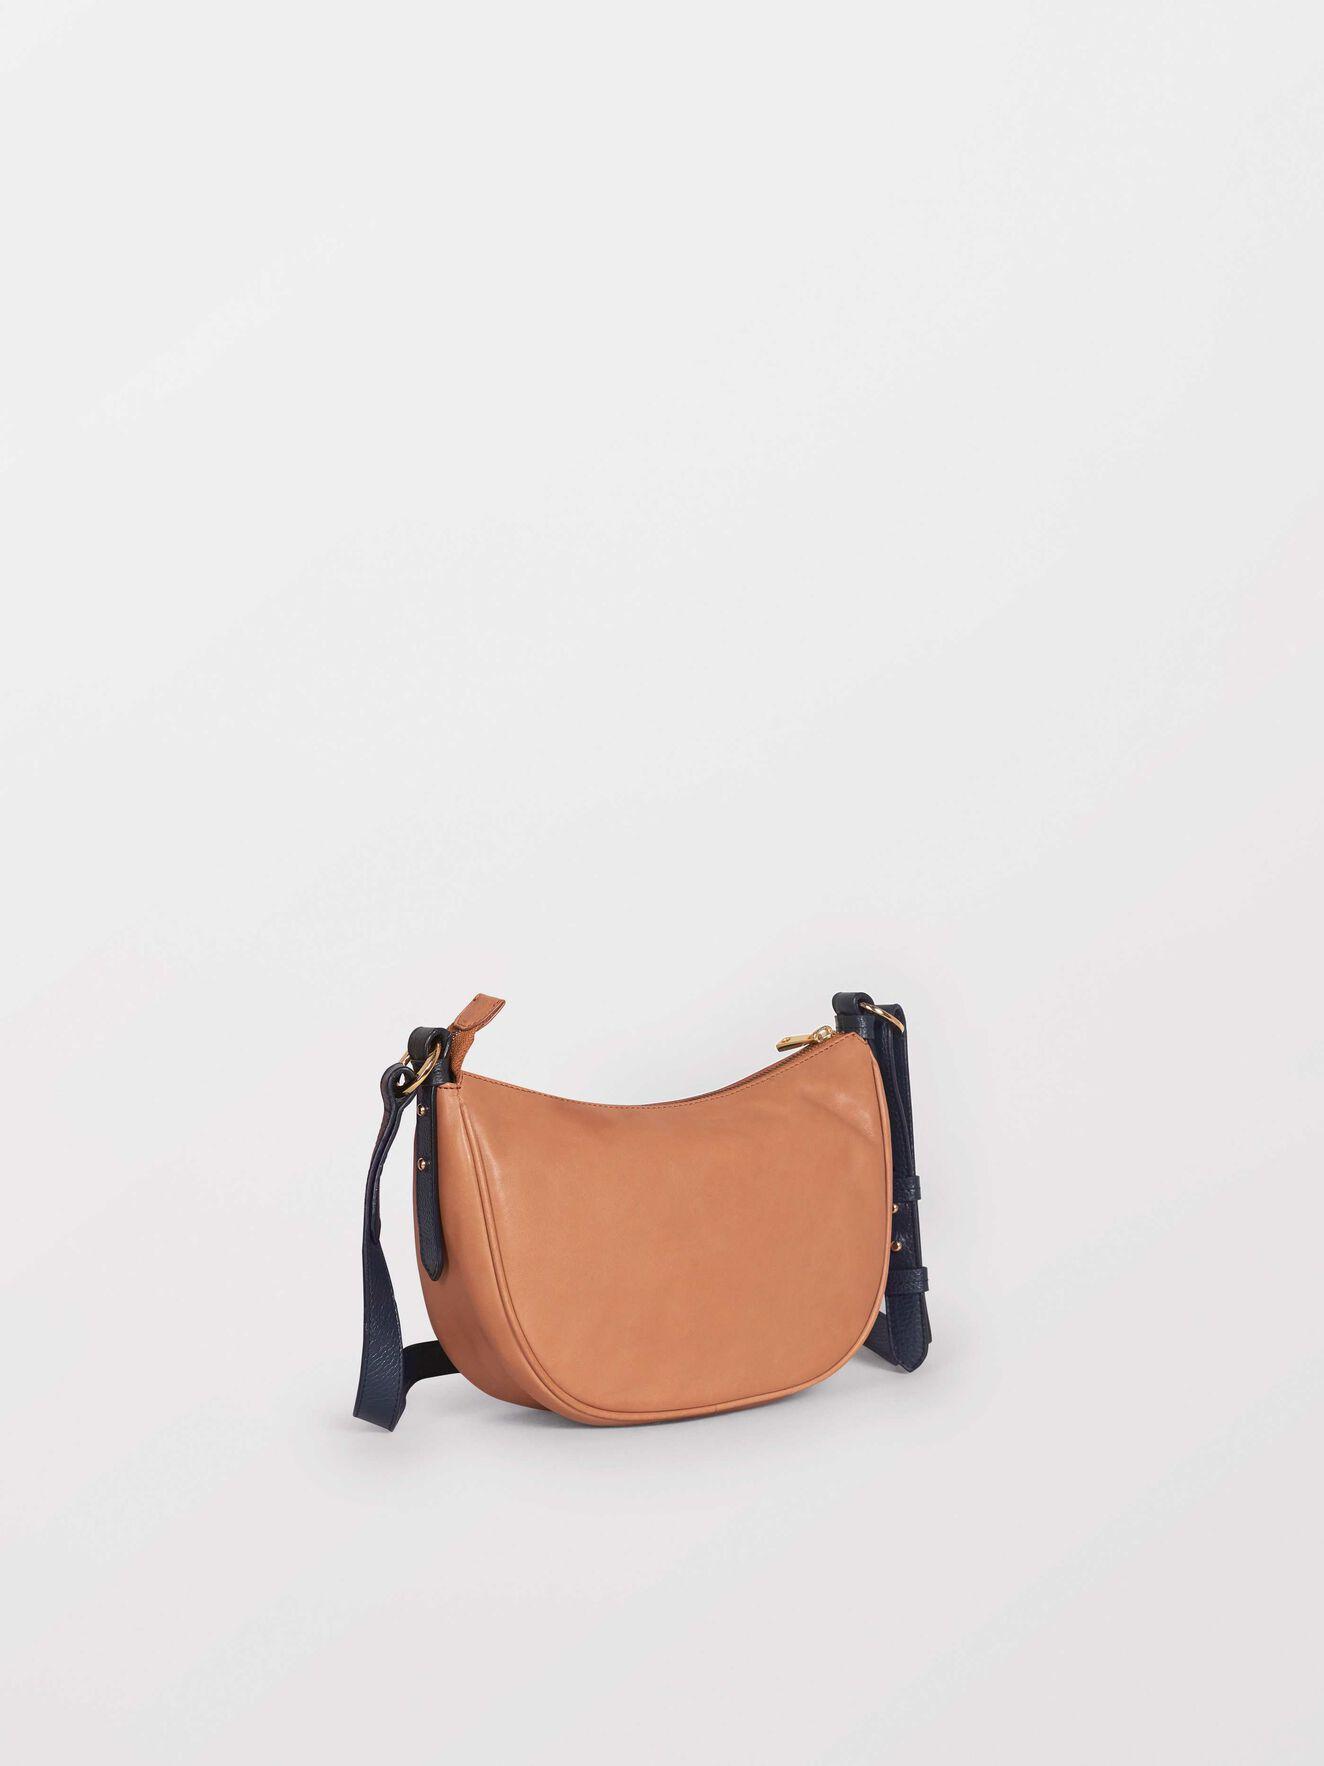 Borziama Bag in Cognac from Tiger of Sweden